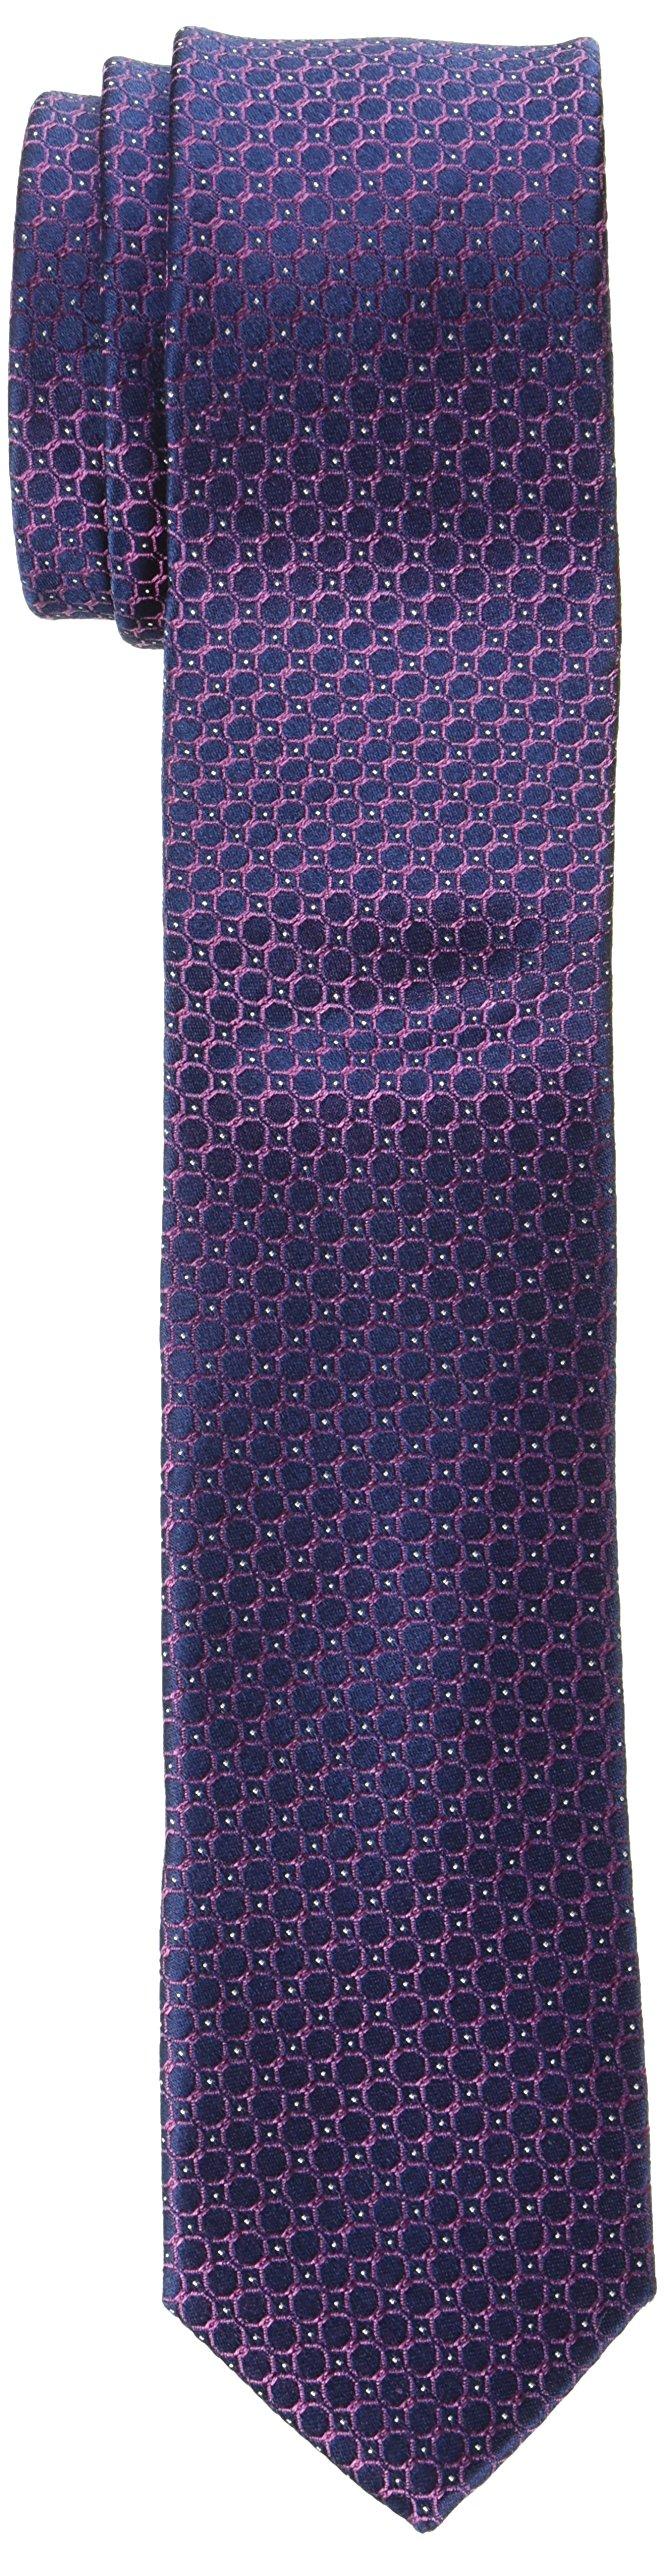 Tommy Hilfiger Chain Link Corbata para Hombre